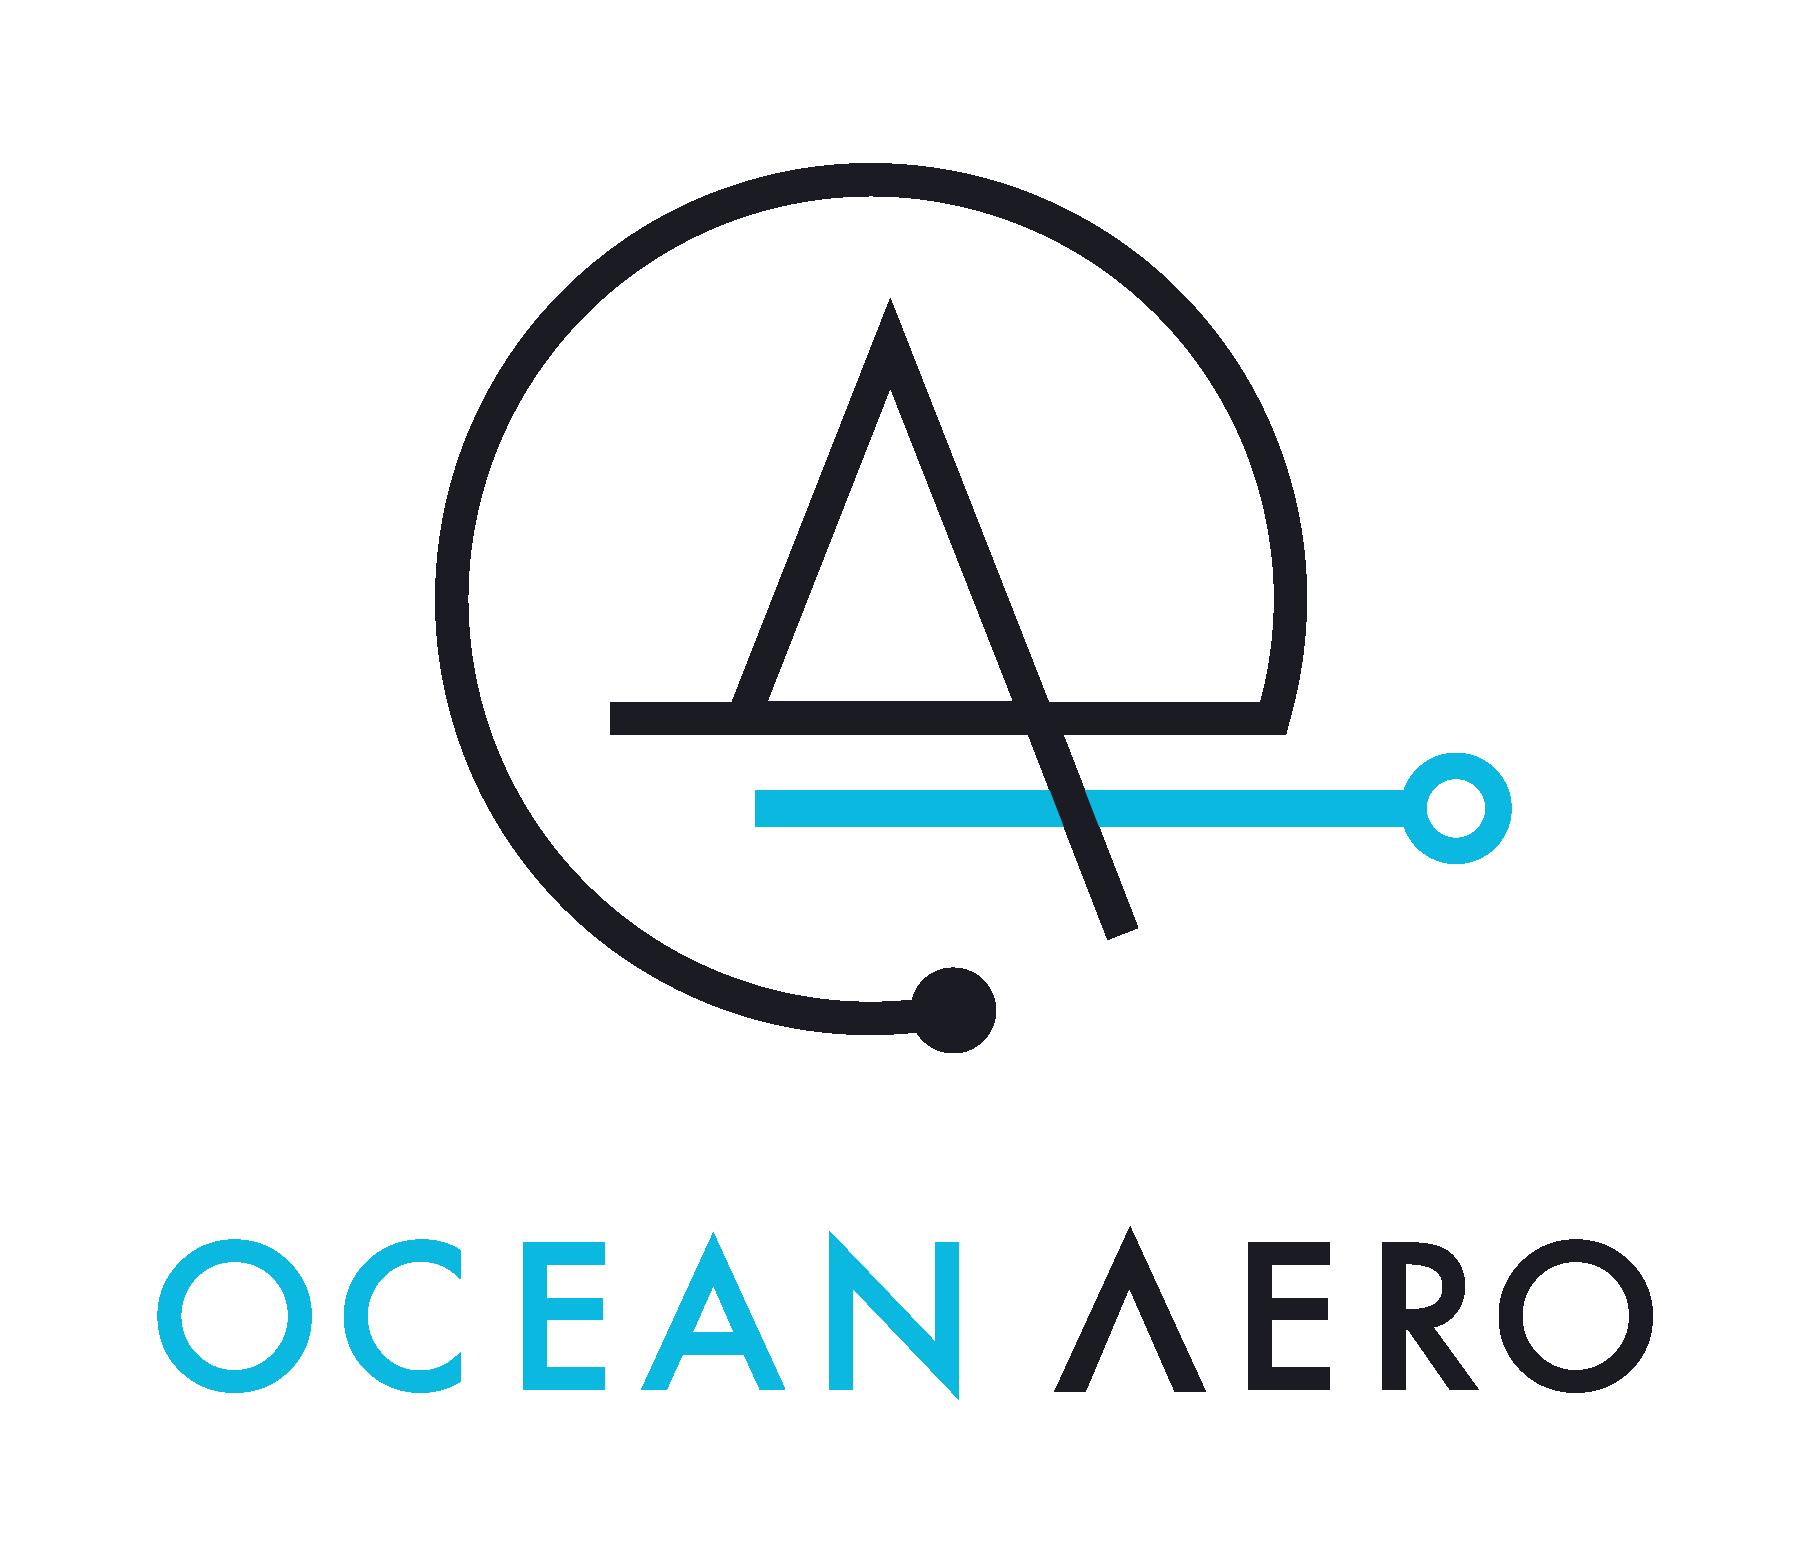 Ocean Aero Announces Series C Funding, San Diego, September 8, 2021